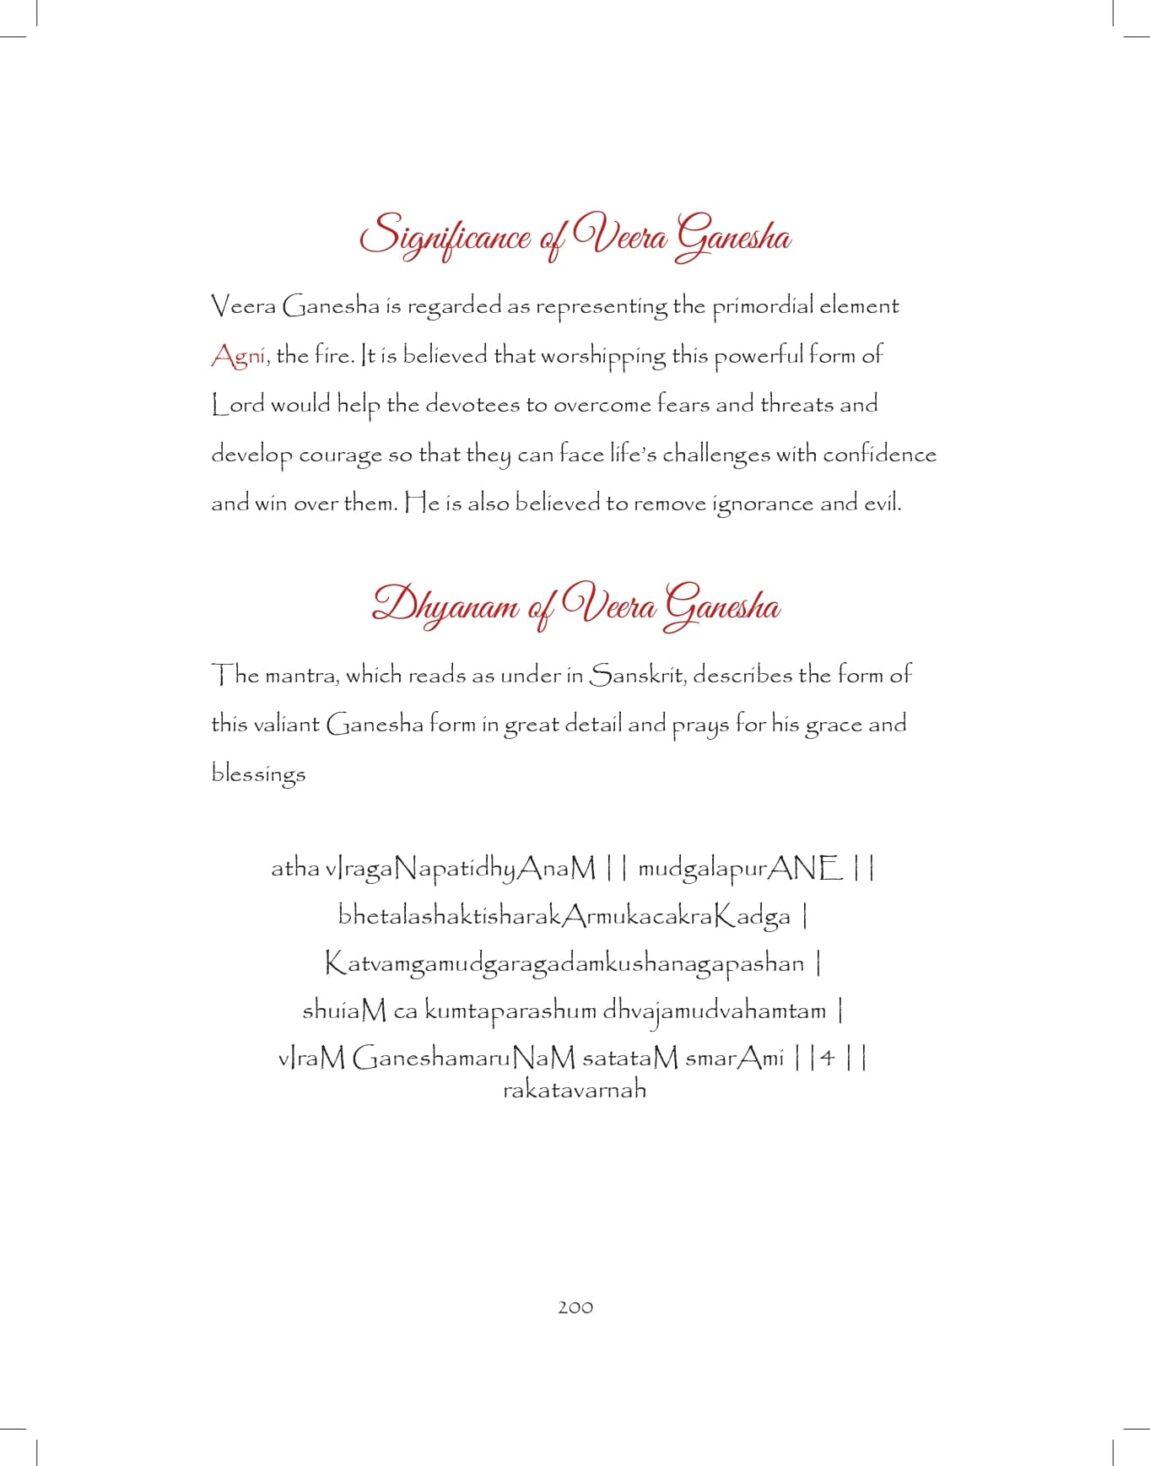 Ganesh-print_pages-to-jpg-0200.jpg